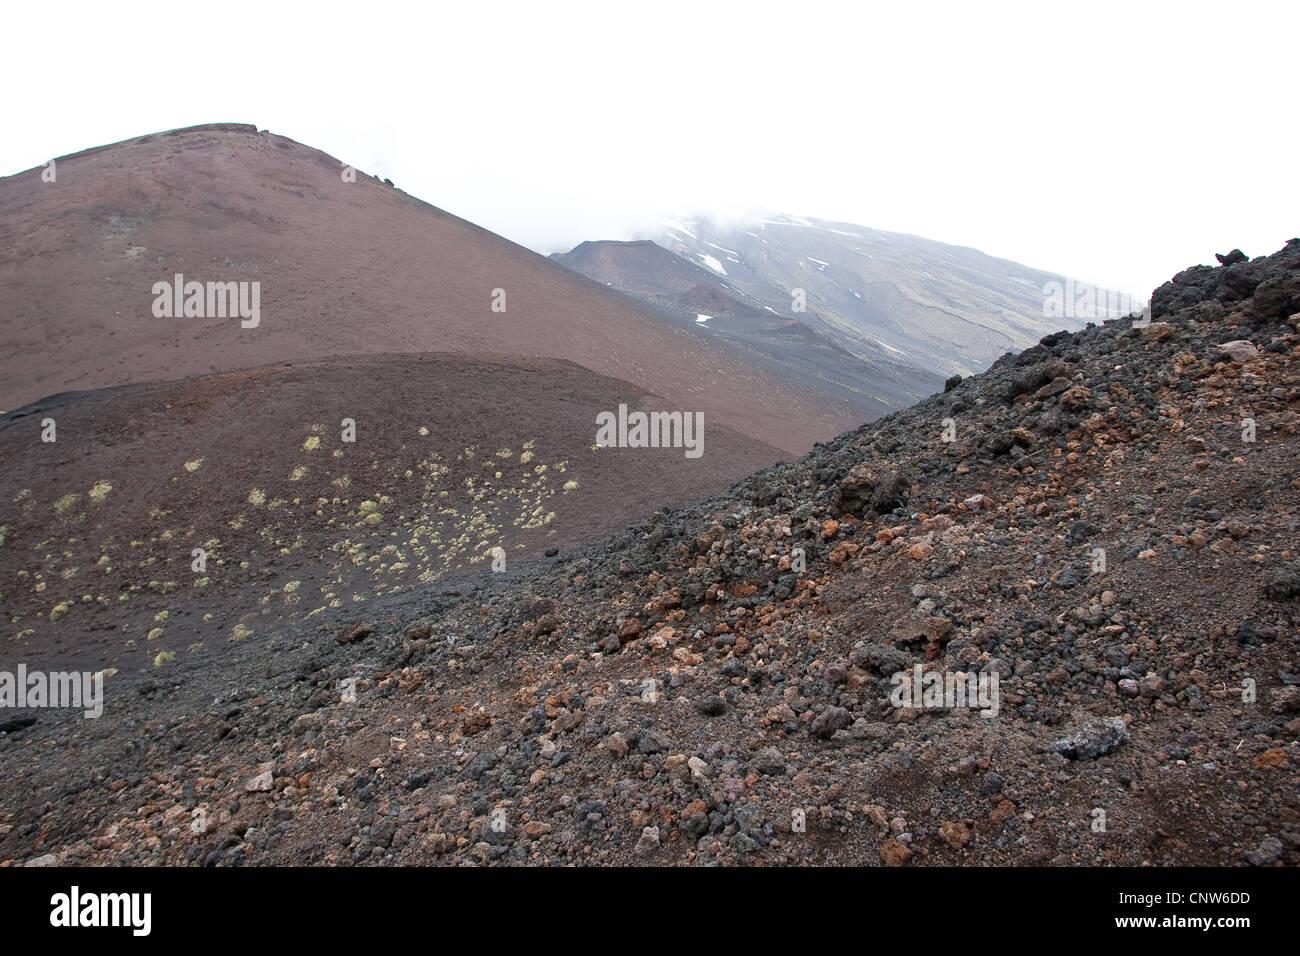 Vulkanlandschaften auf den Ätna, Italien, Sizilien Stockbild